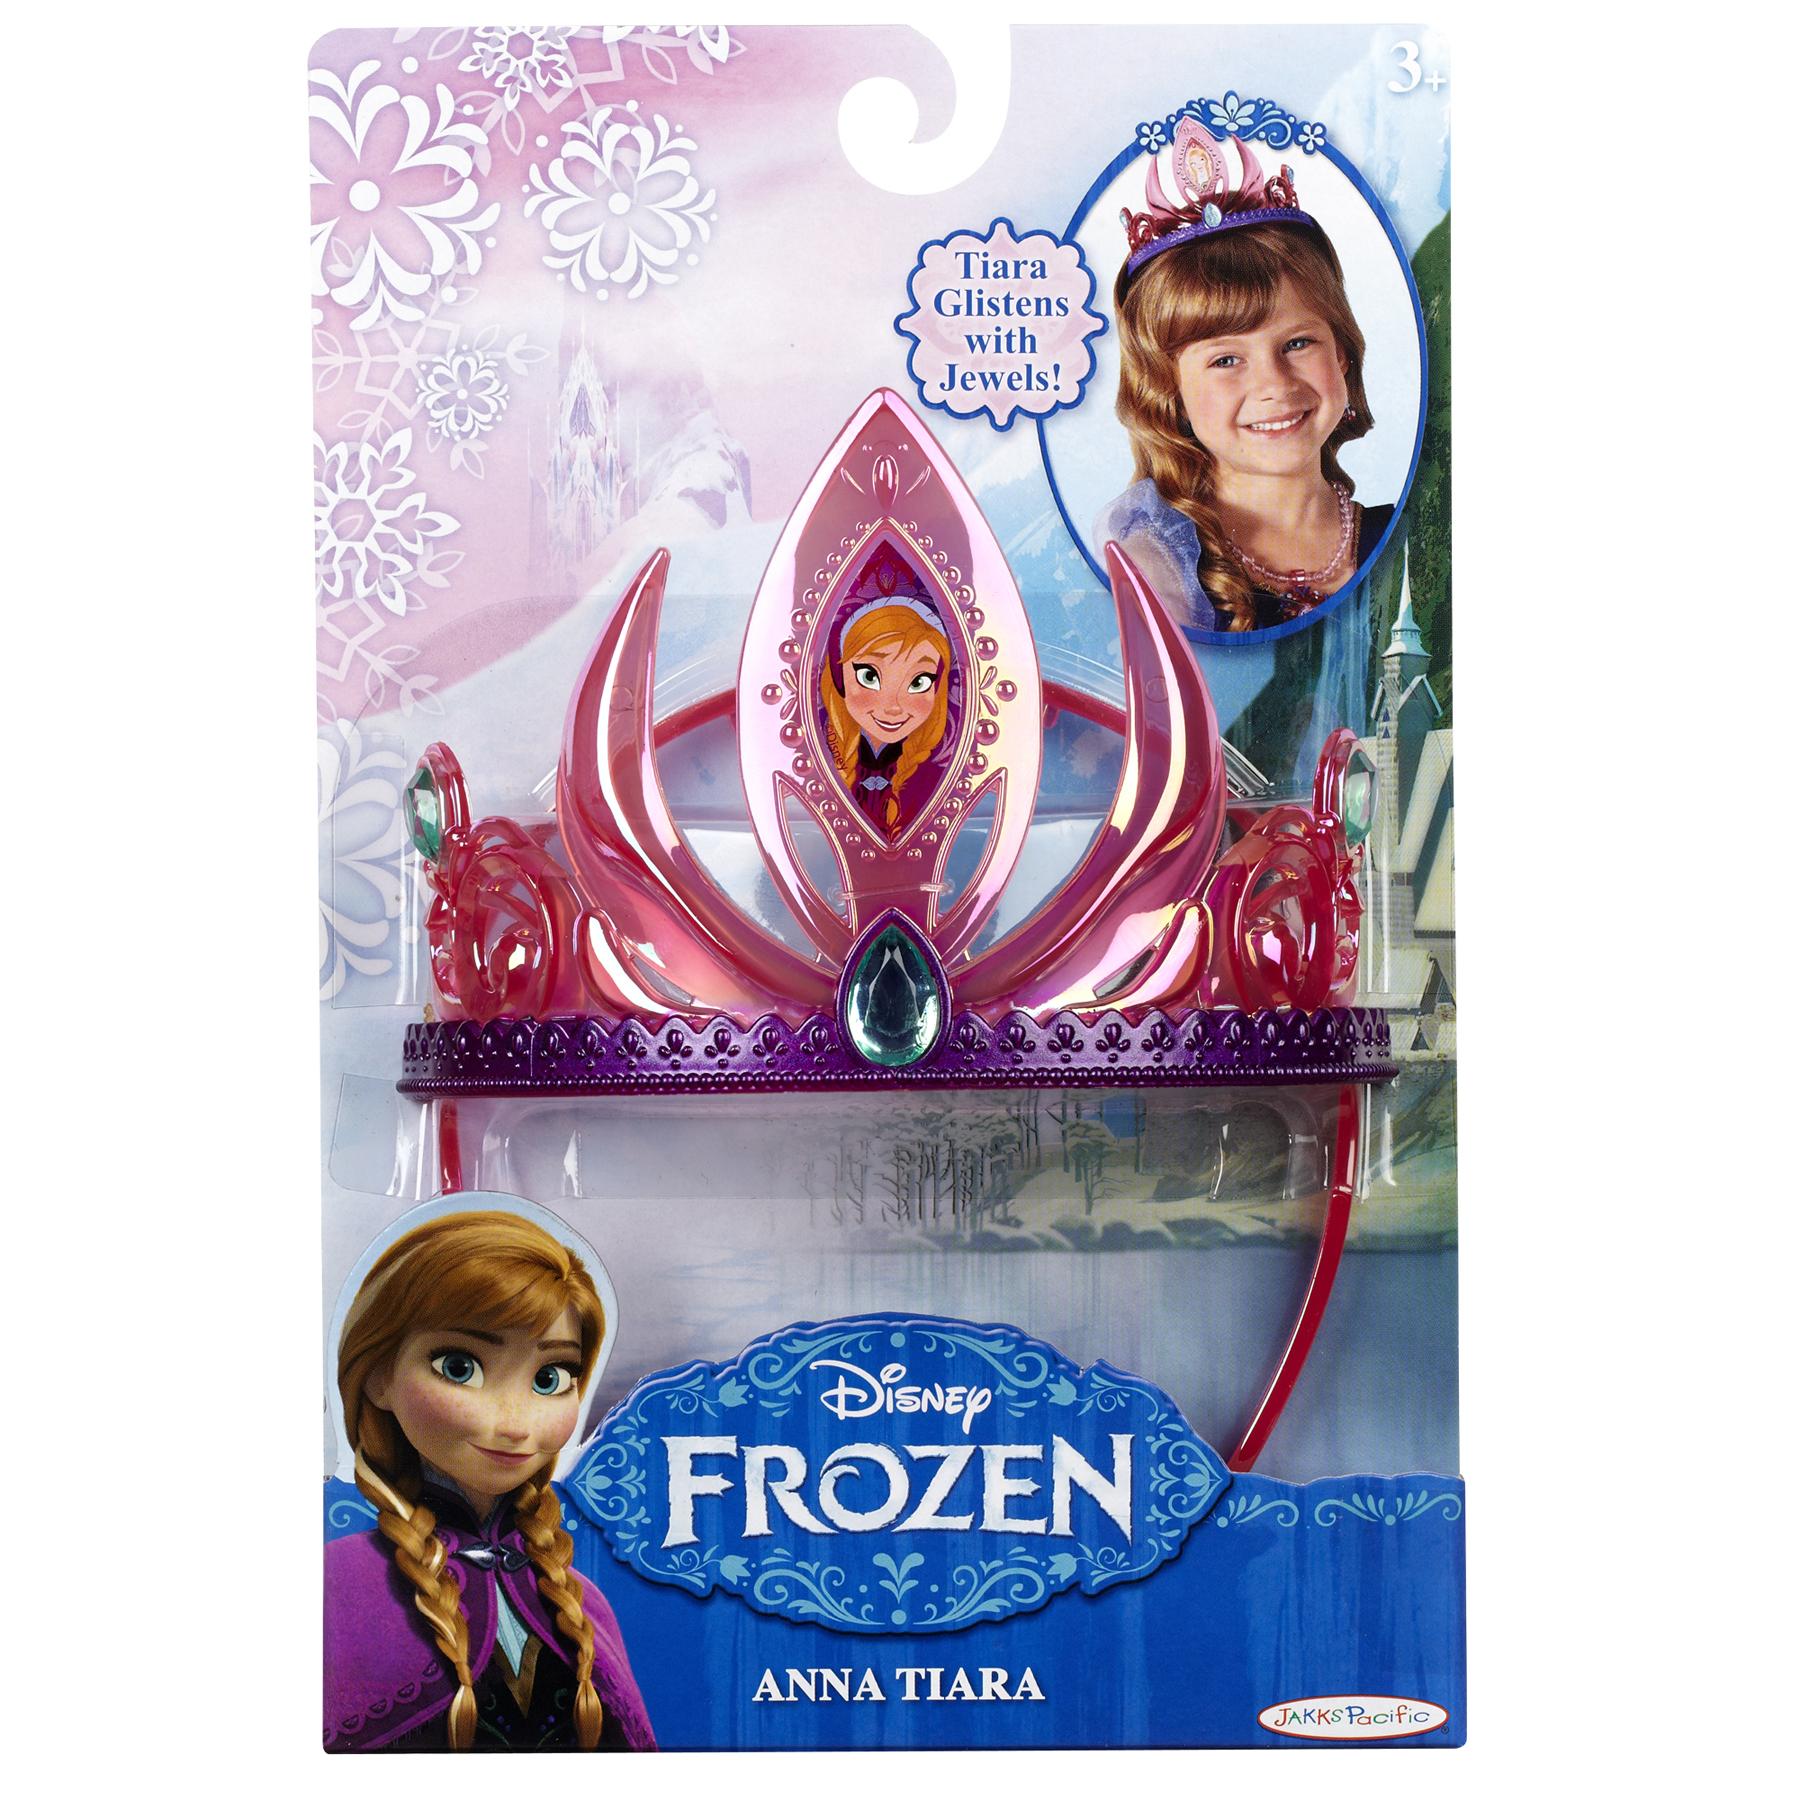 Disney Frozen Anna Tiara